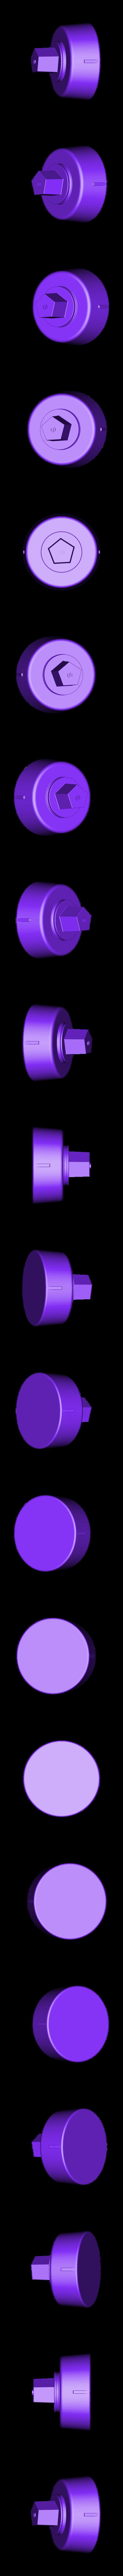 Fire hydrant v15_Fire hydrant v15_right valve_.stl Download STL file Fire hydrant • Model to 3D print, AntonShtern